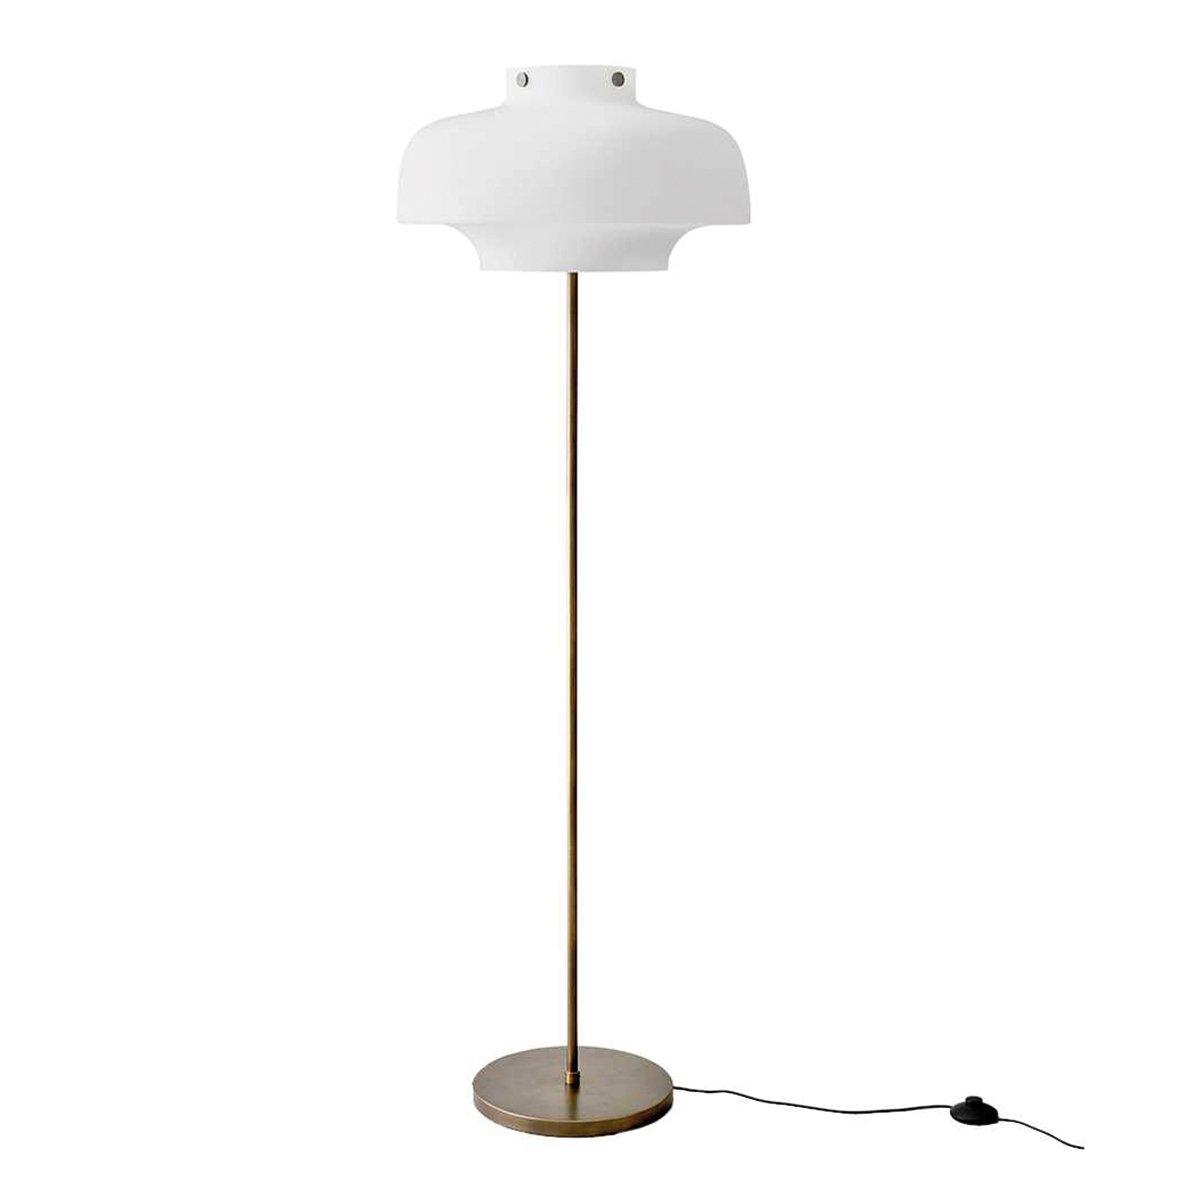 &Tradition Copenhagen Tafellamp SC14